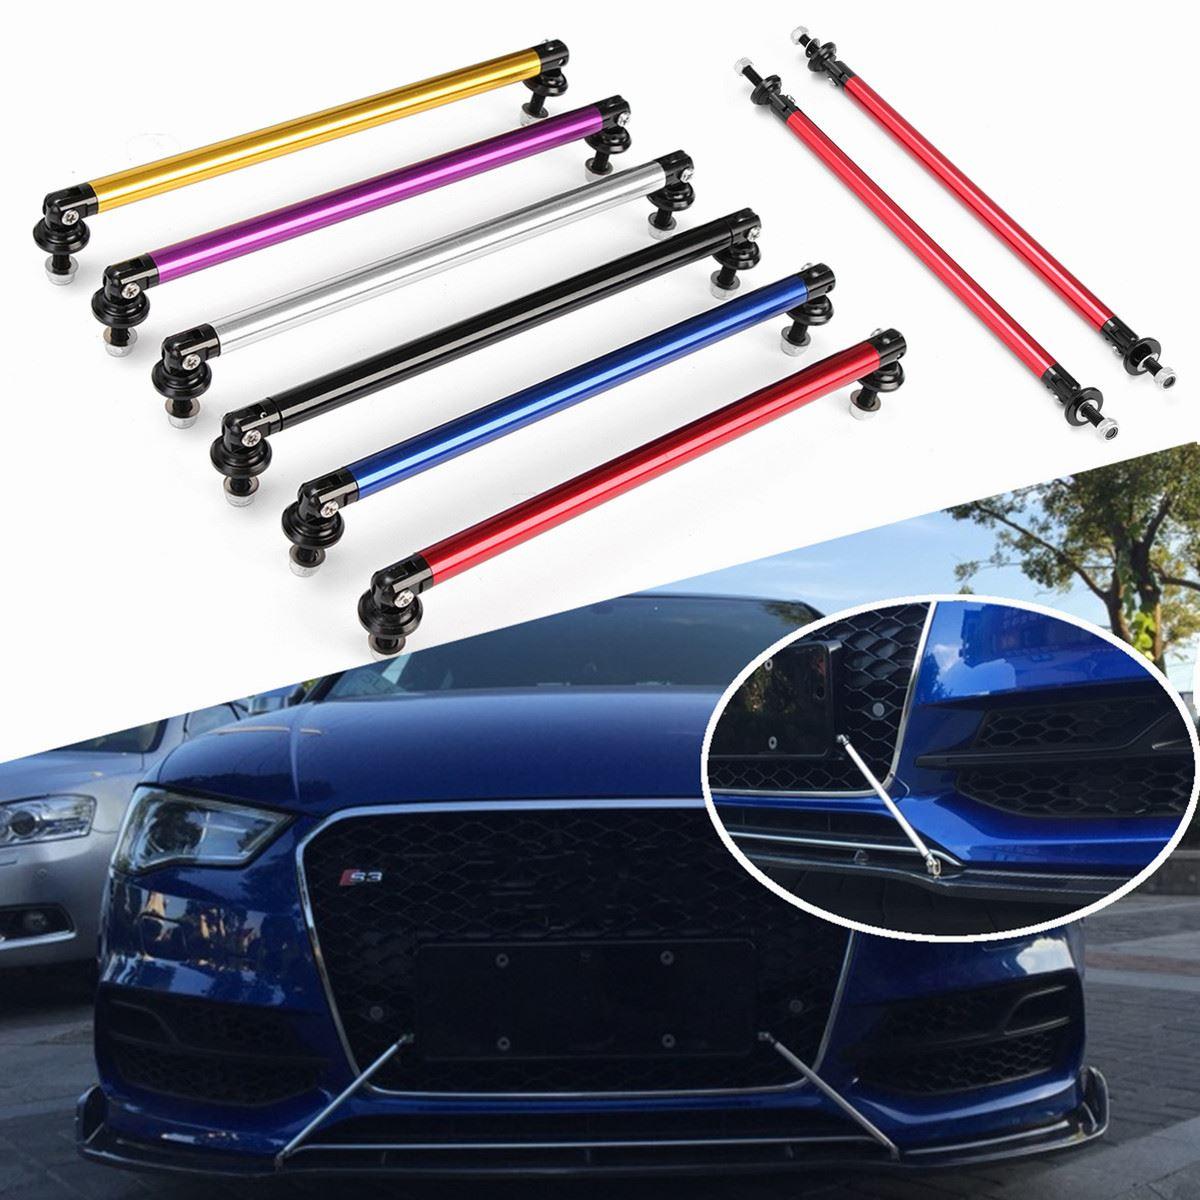 2x Universal 200mm Adjustable Front Rear Bumper Lip Splitter Rod Support Bars 2x front